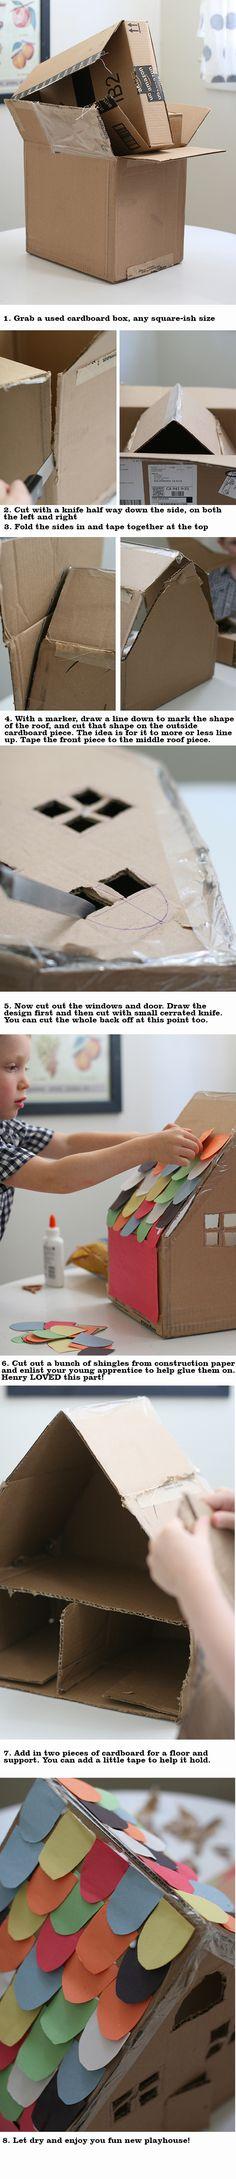 making a cardboard box kids craft